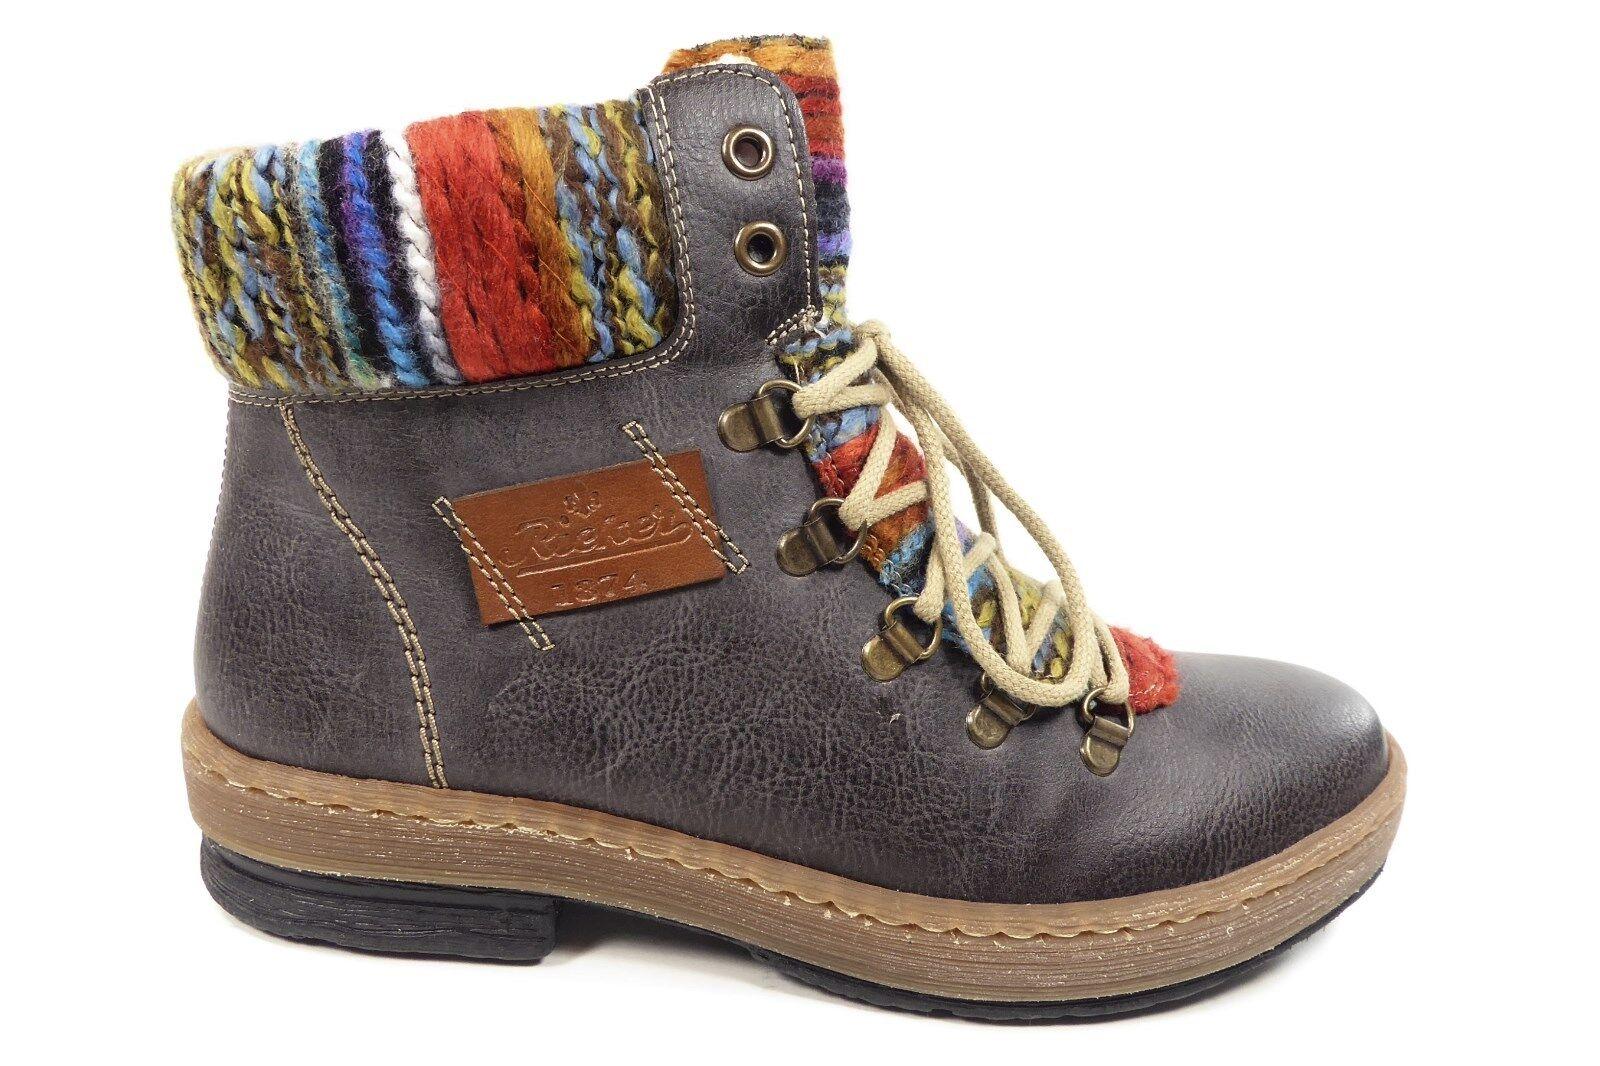 Rieker Damenschuhe Stiefel Z6743-45 Reißverschluss Z6743-45 Stiefel Grau 06992b